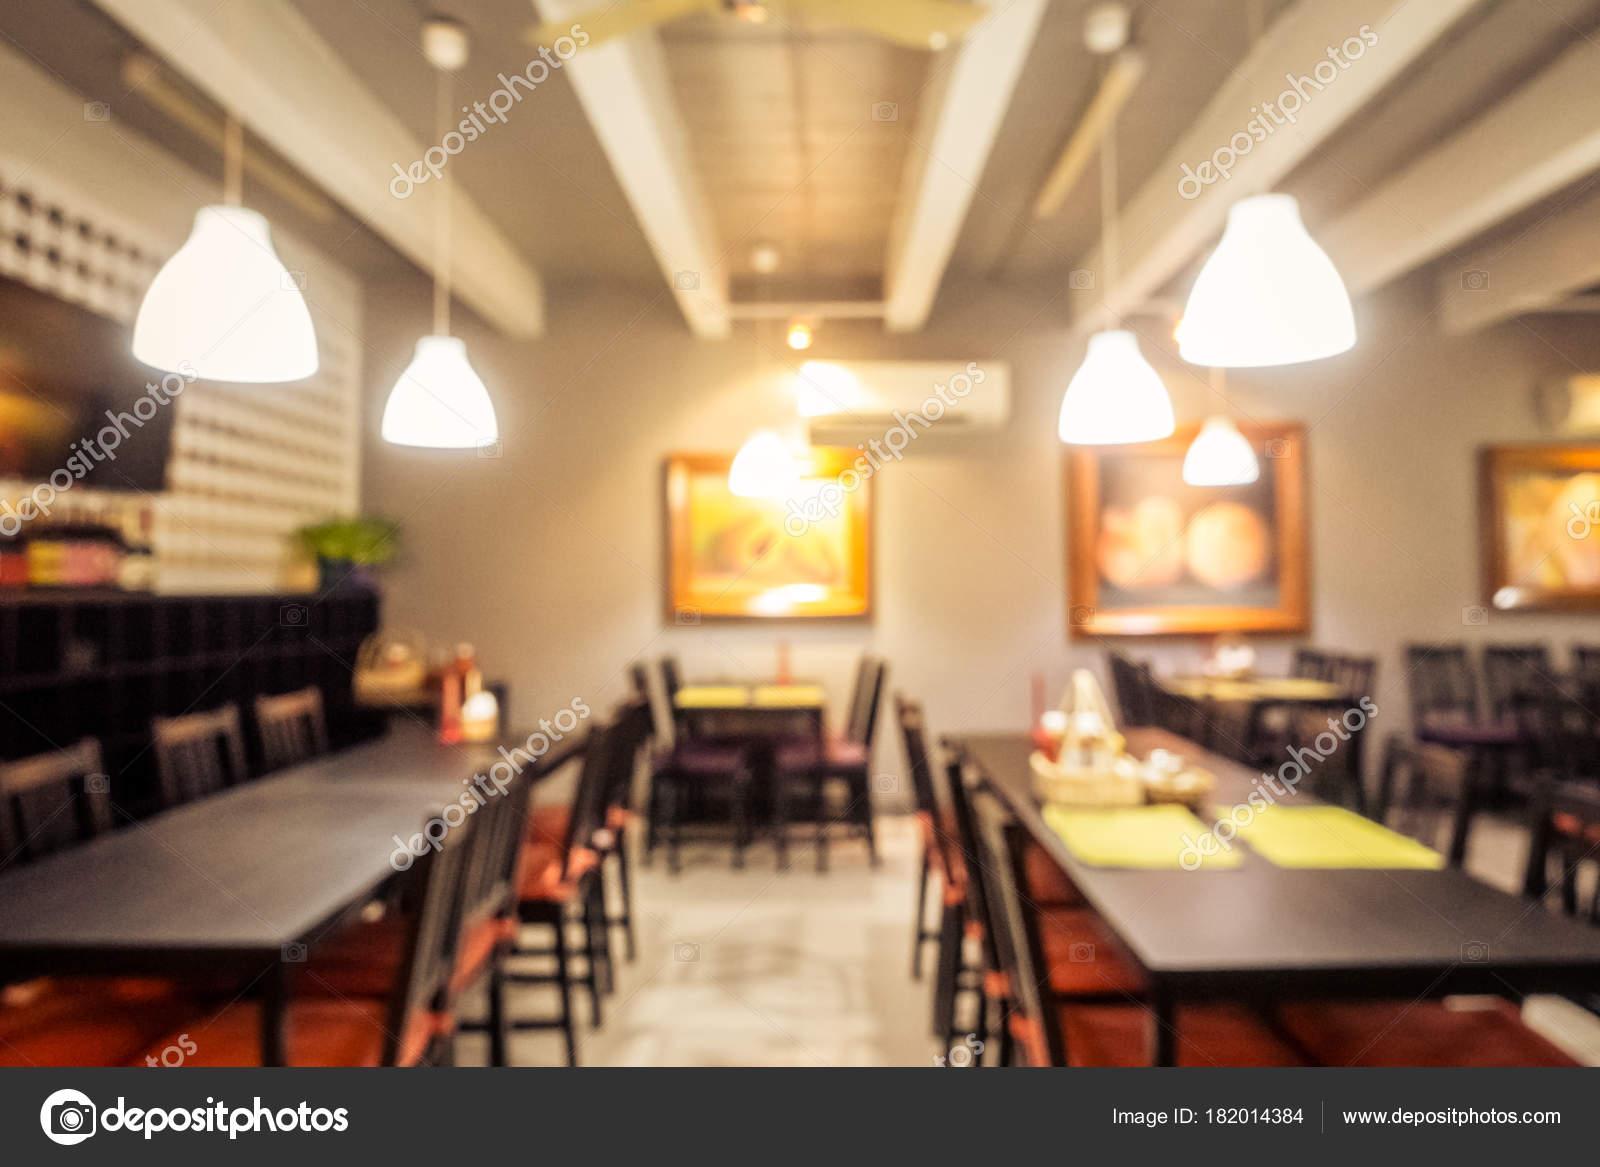 Abstract Blur Coffee Shop Cafe Restaurant Interior Background Vintage Filter Stock Photo C Mrsiraphol 182014384